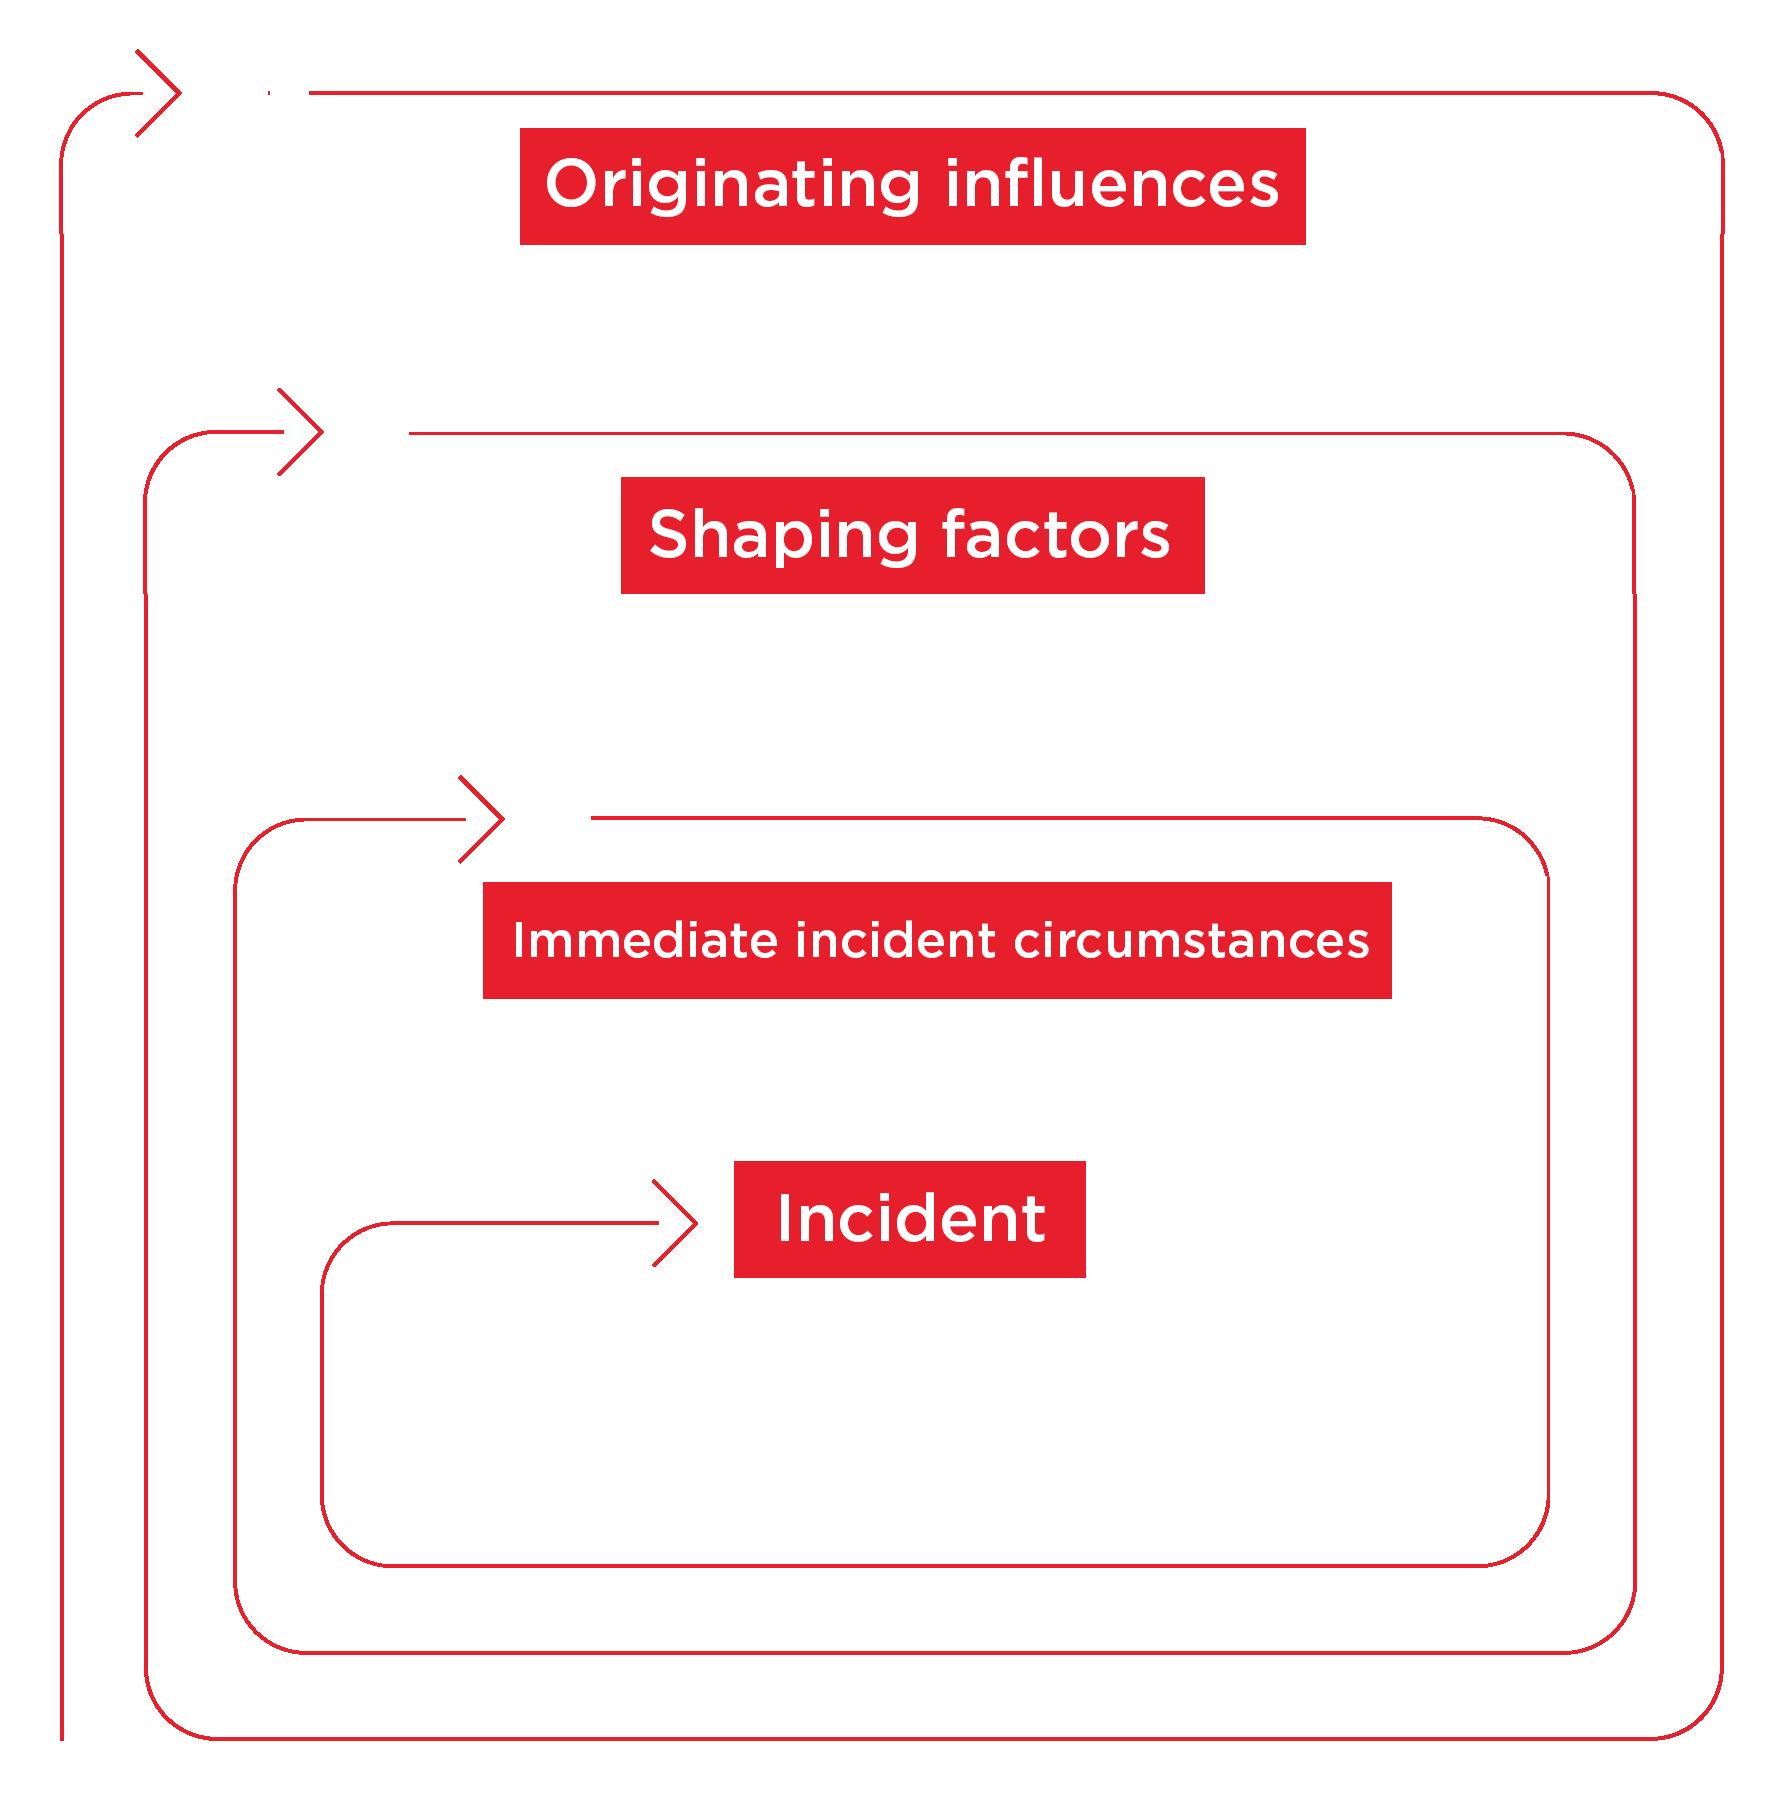 causal factors in info graphic